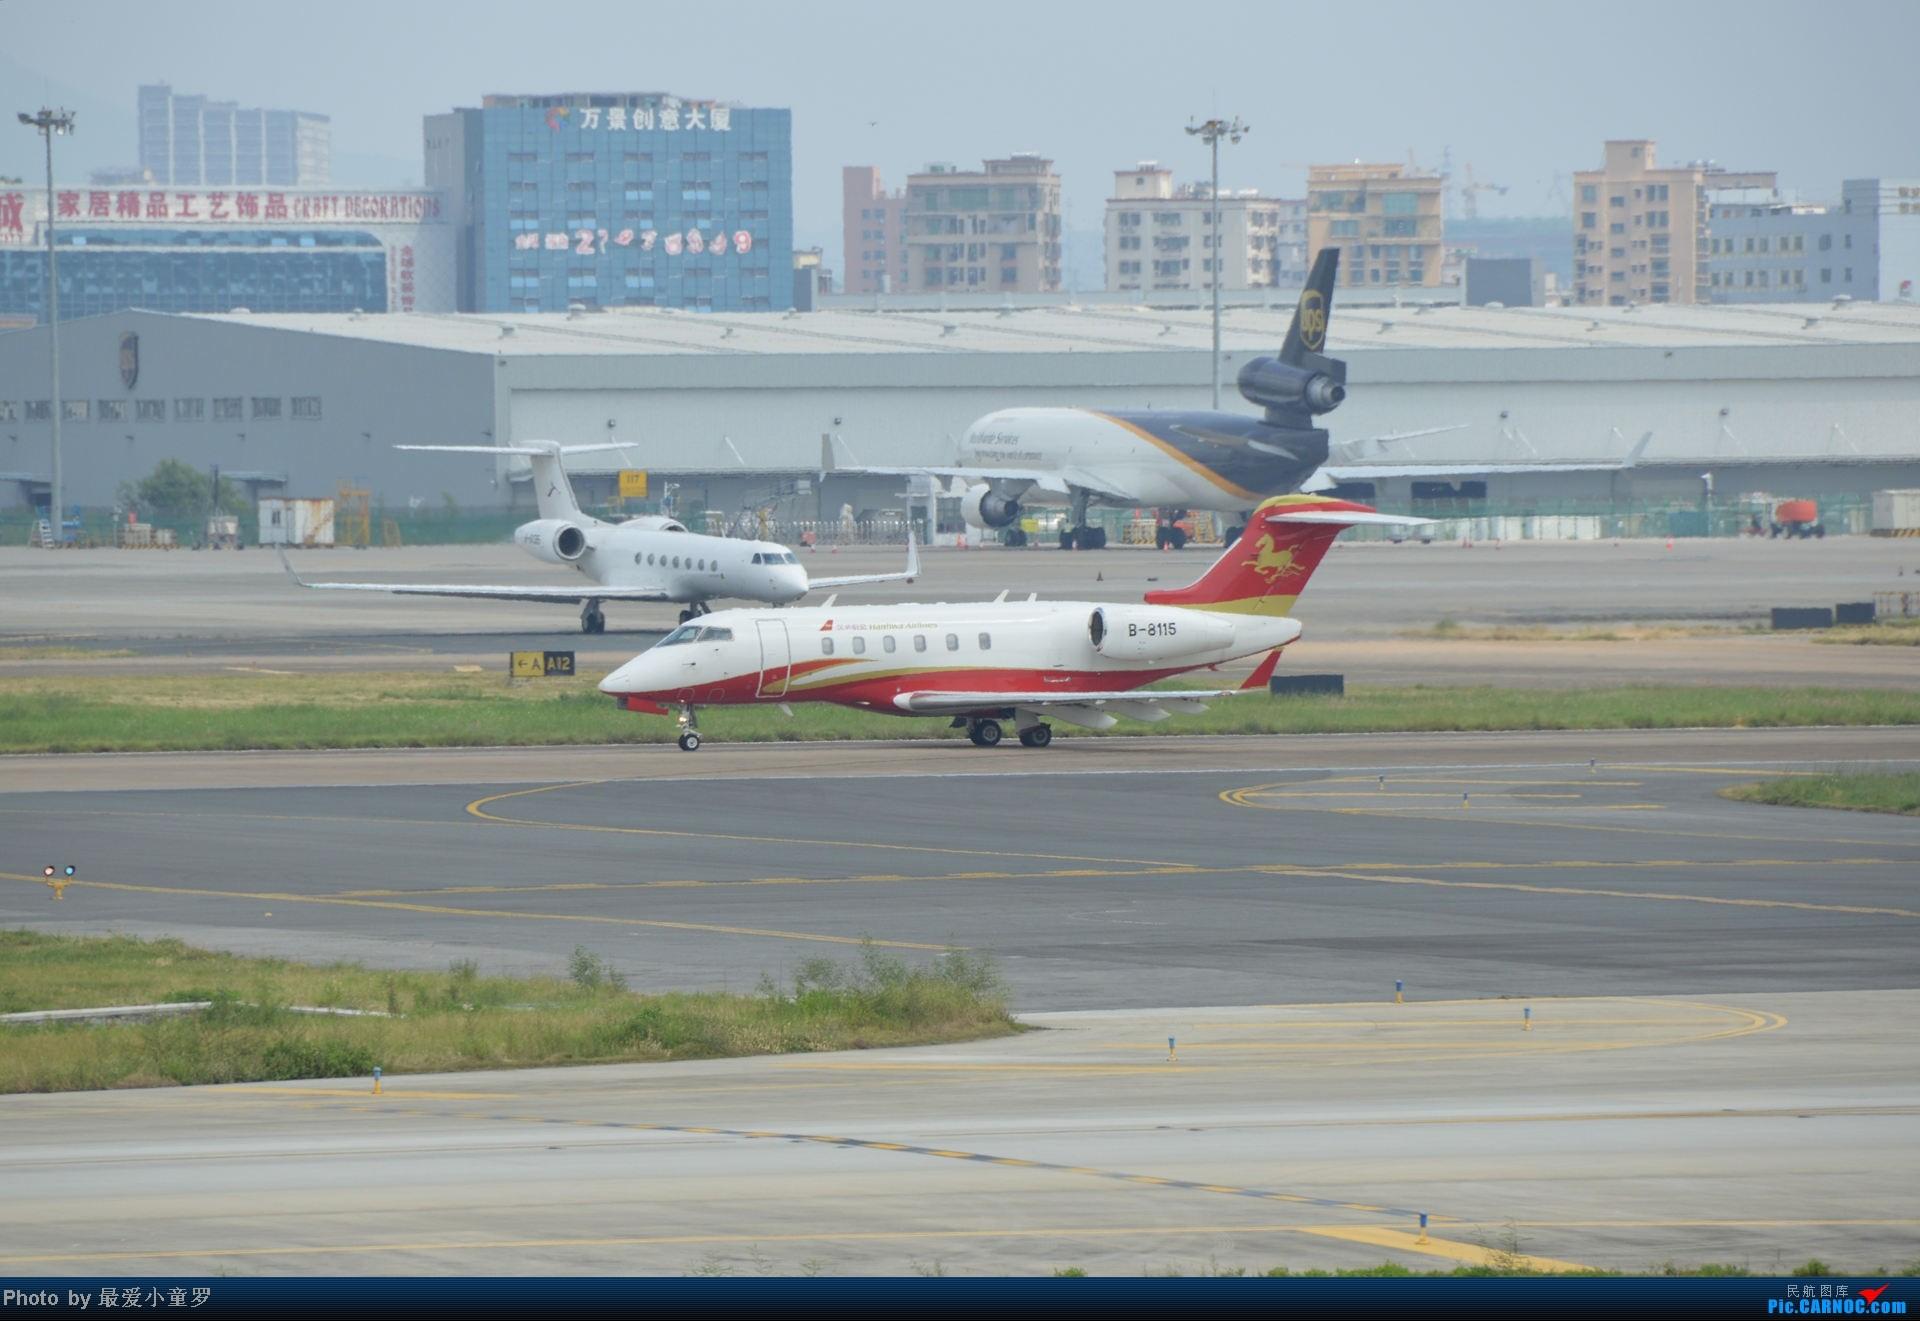 Re:[原创]2014年国庆假期深圳广州四天拍机,多图没怎么修 BOMBARDIER CHALLENGER B-8115